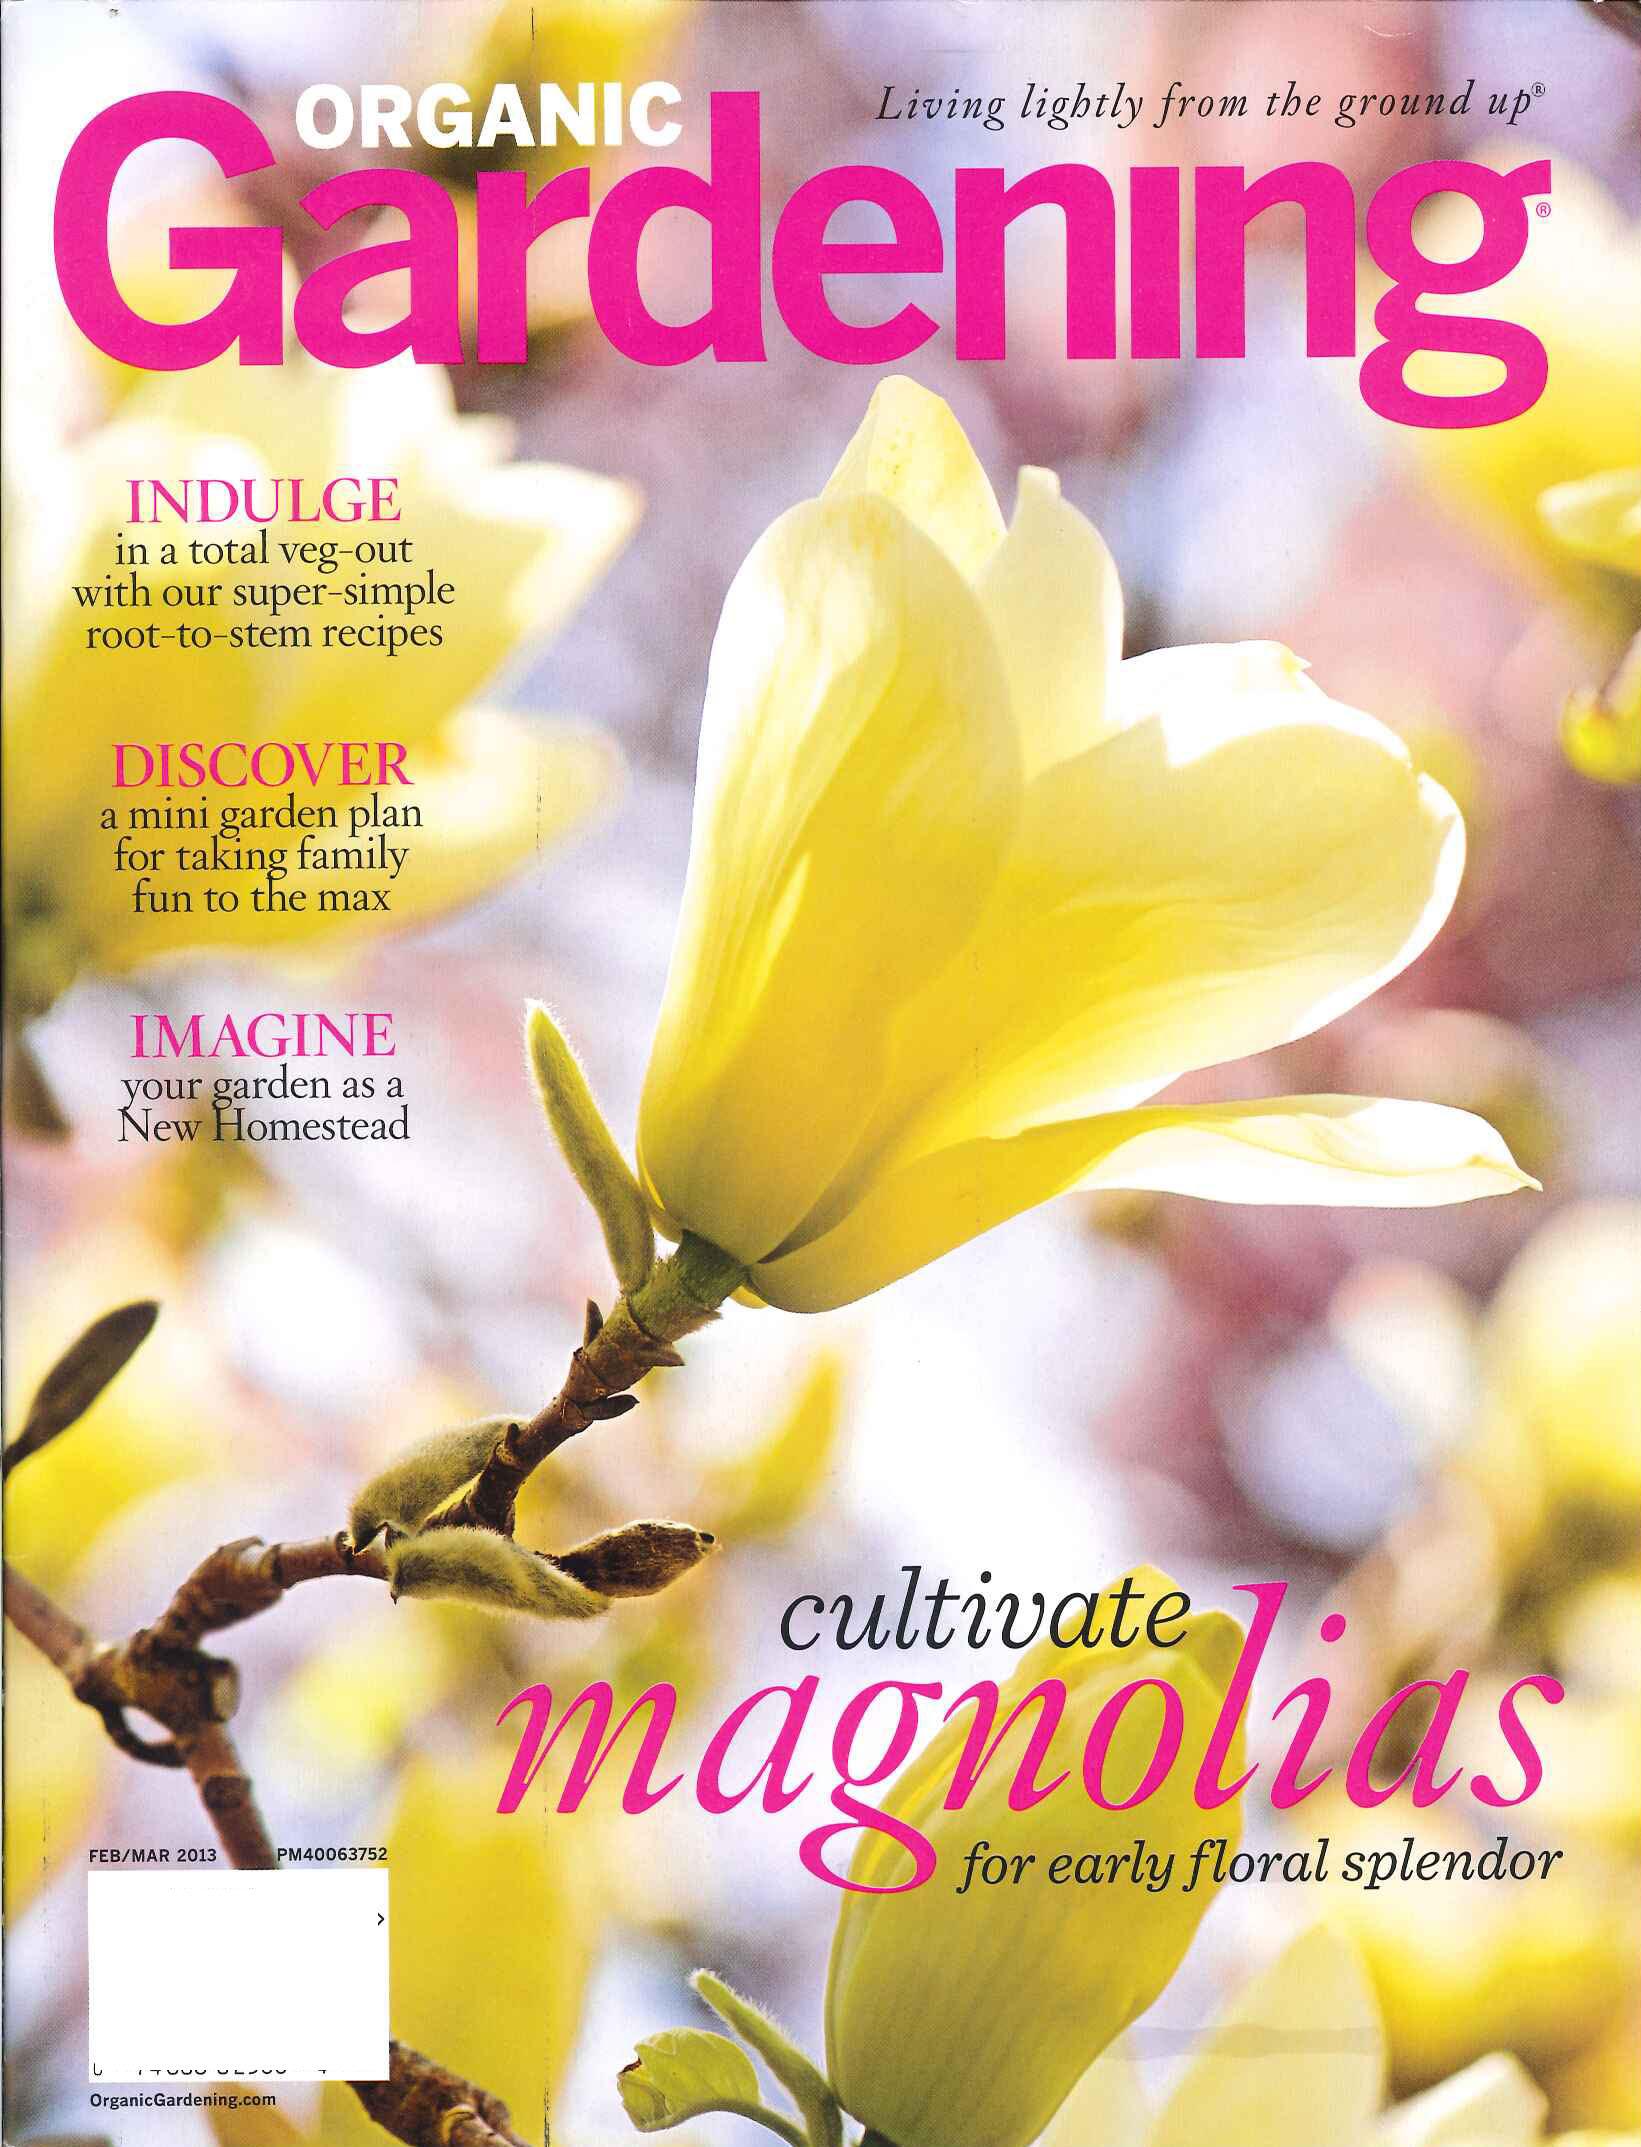 fine organic gardening, rescue, stink bug trap, garden media group, rescue